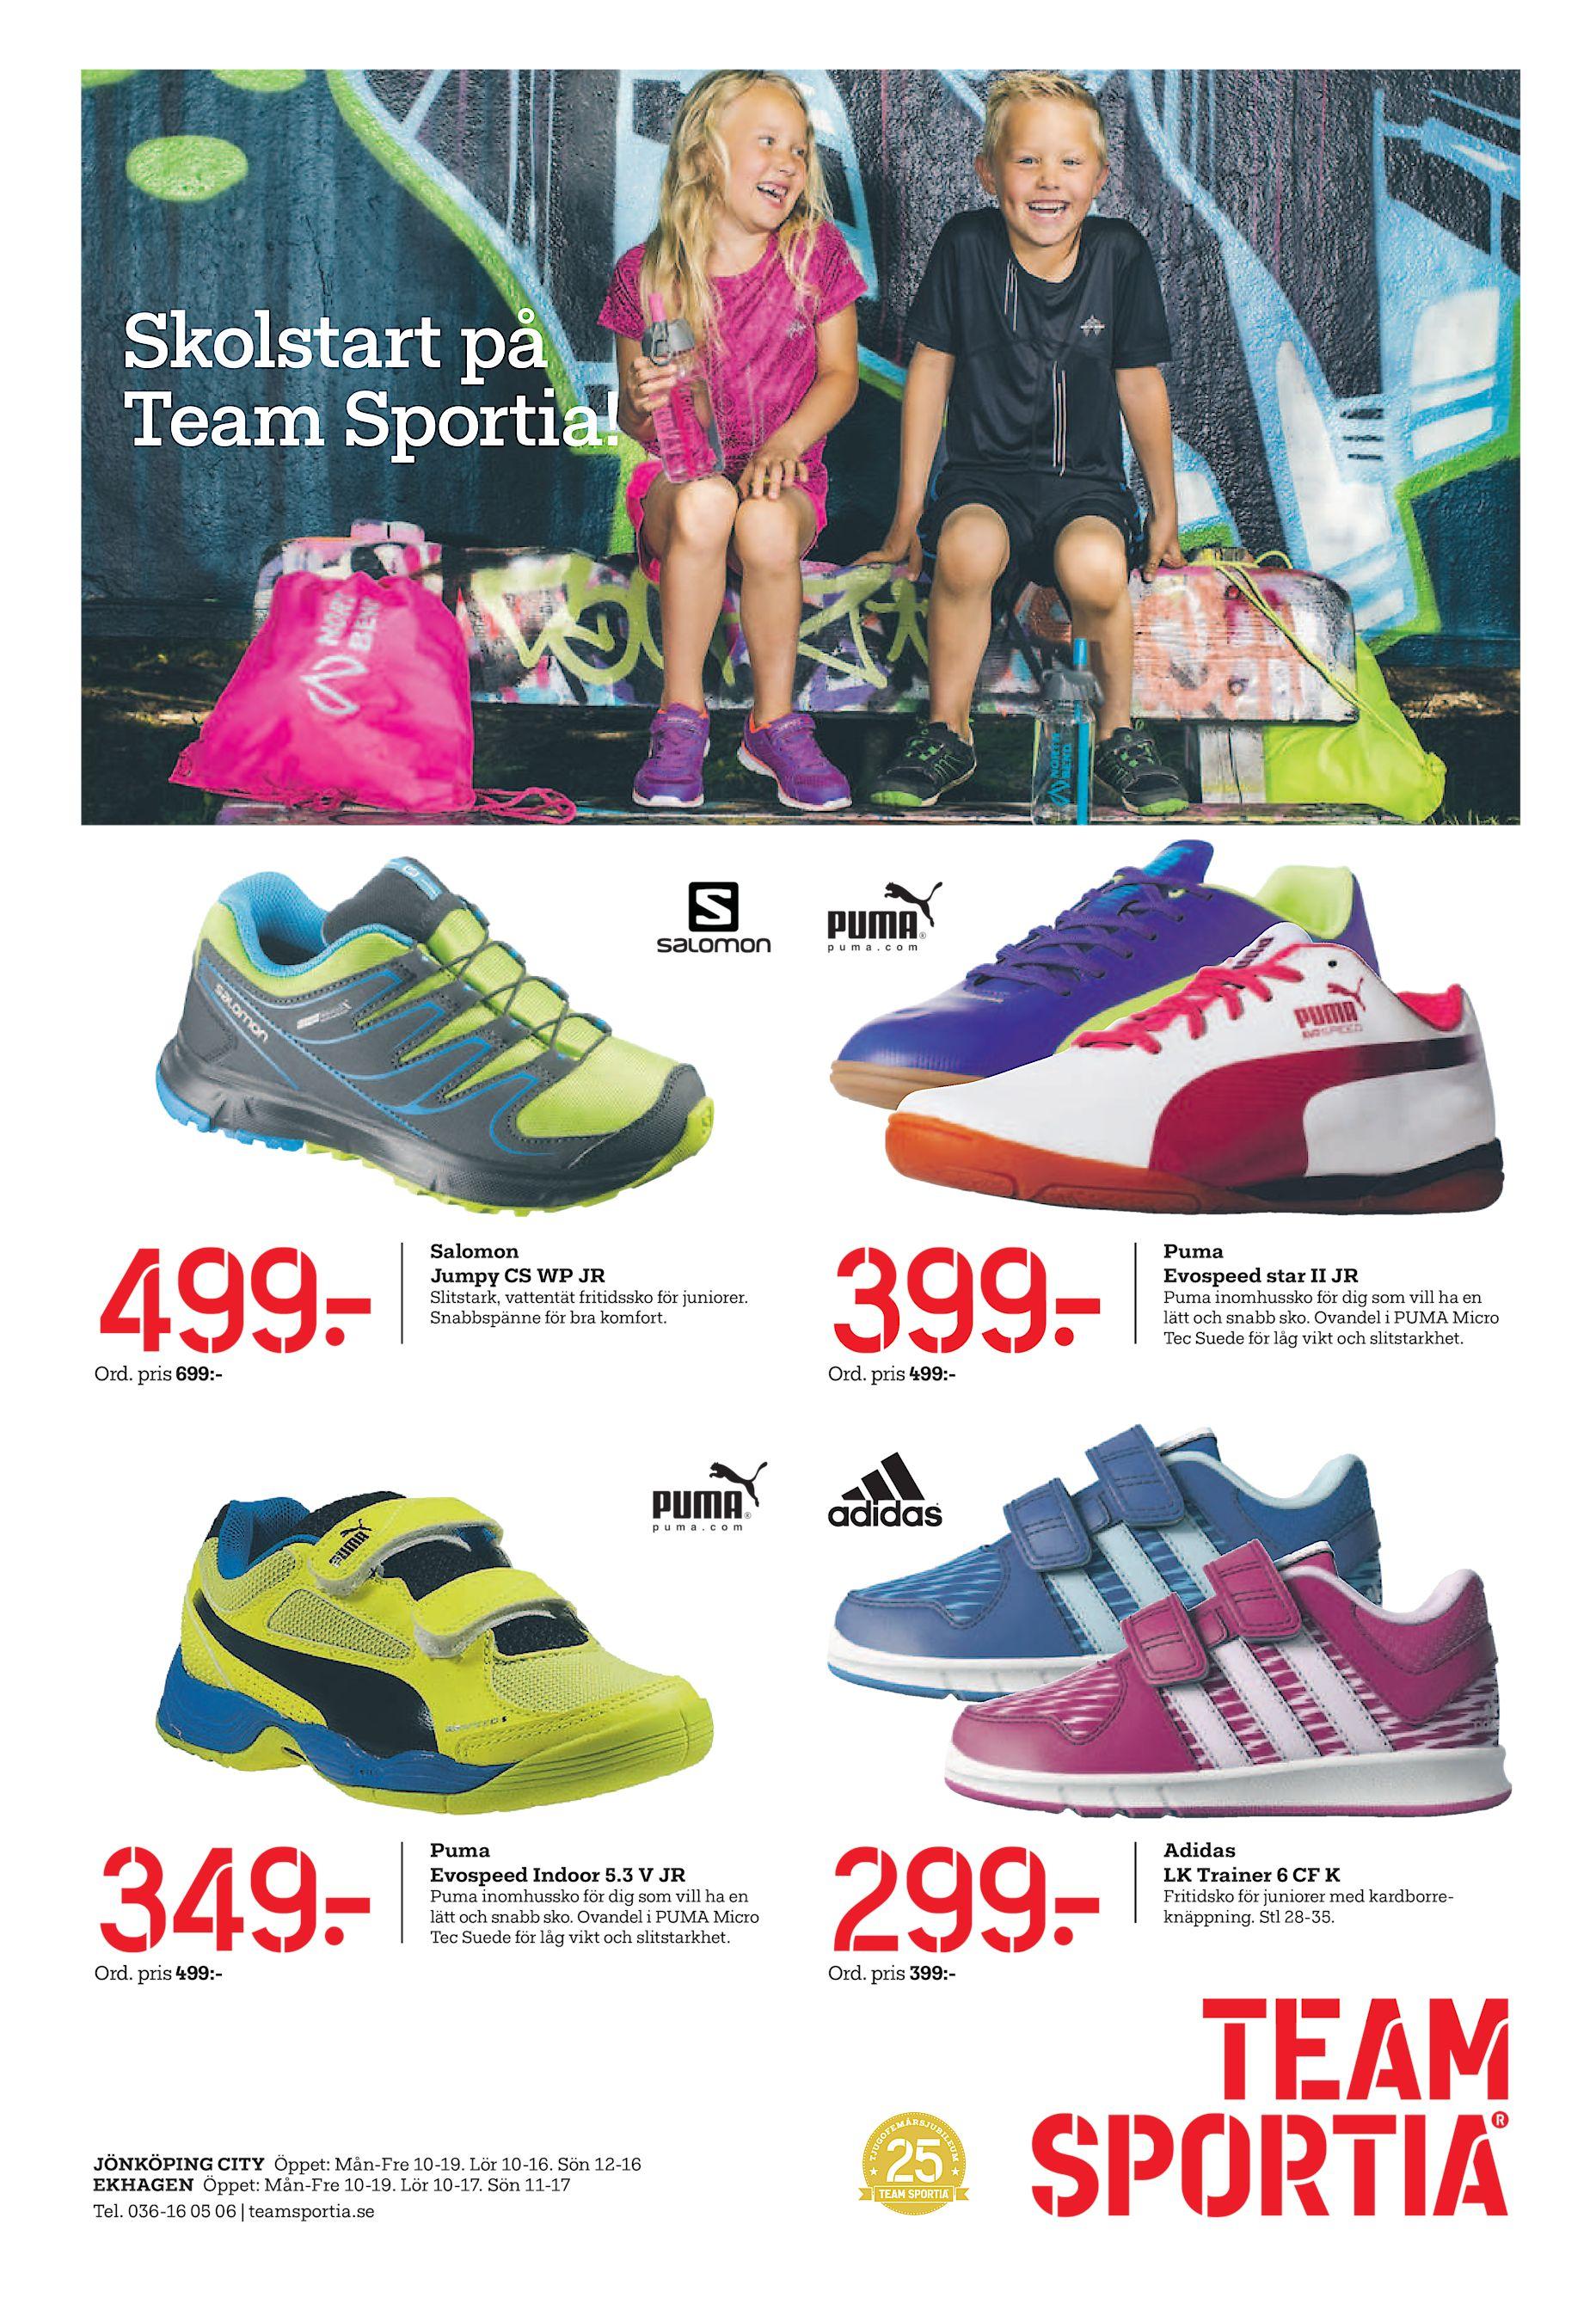 Skolstart på Team Sportia! 499  Salomon Jumpy CS WP JR Slitstark 90628e9645